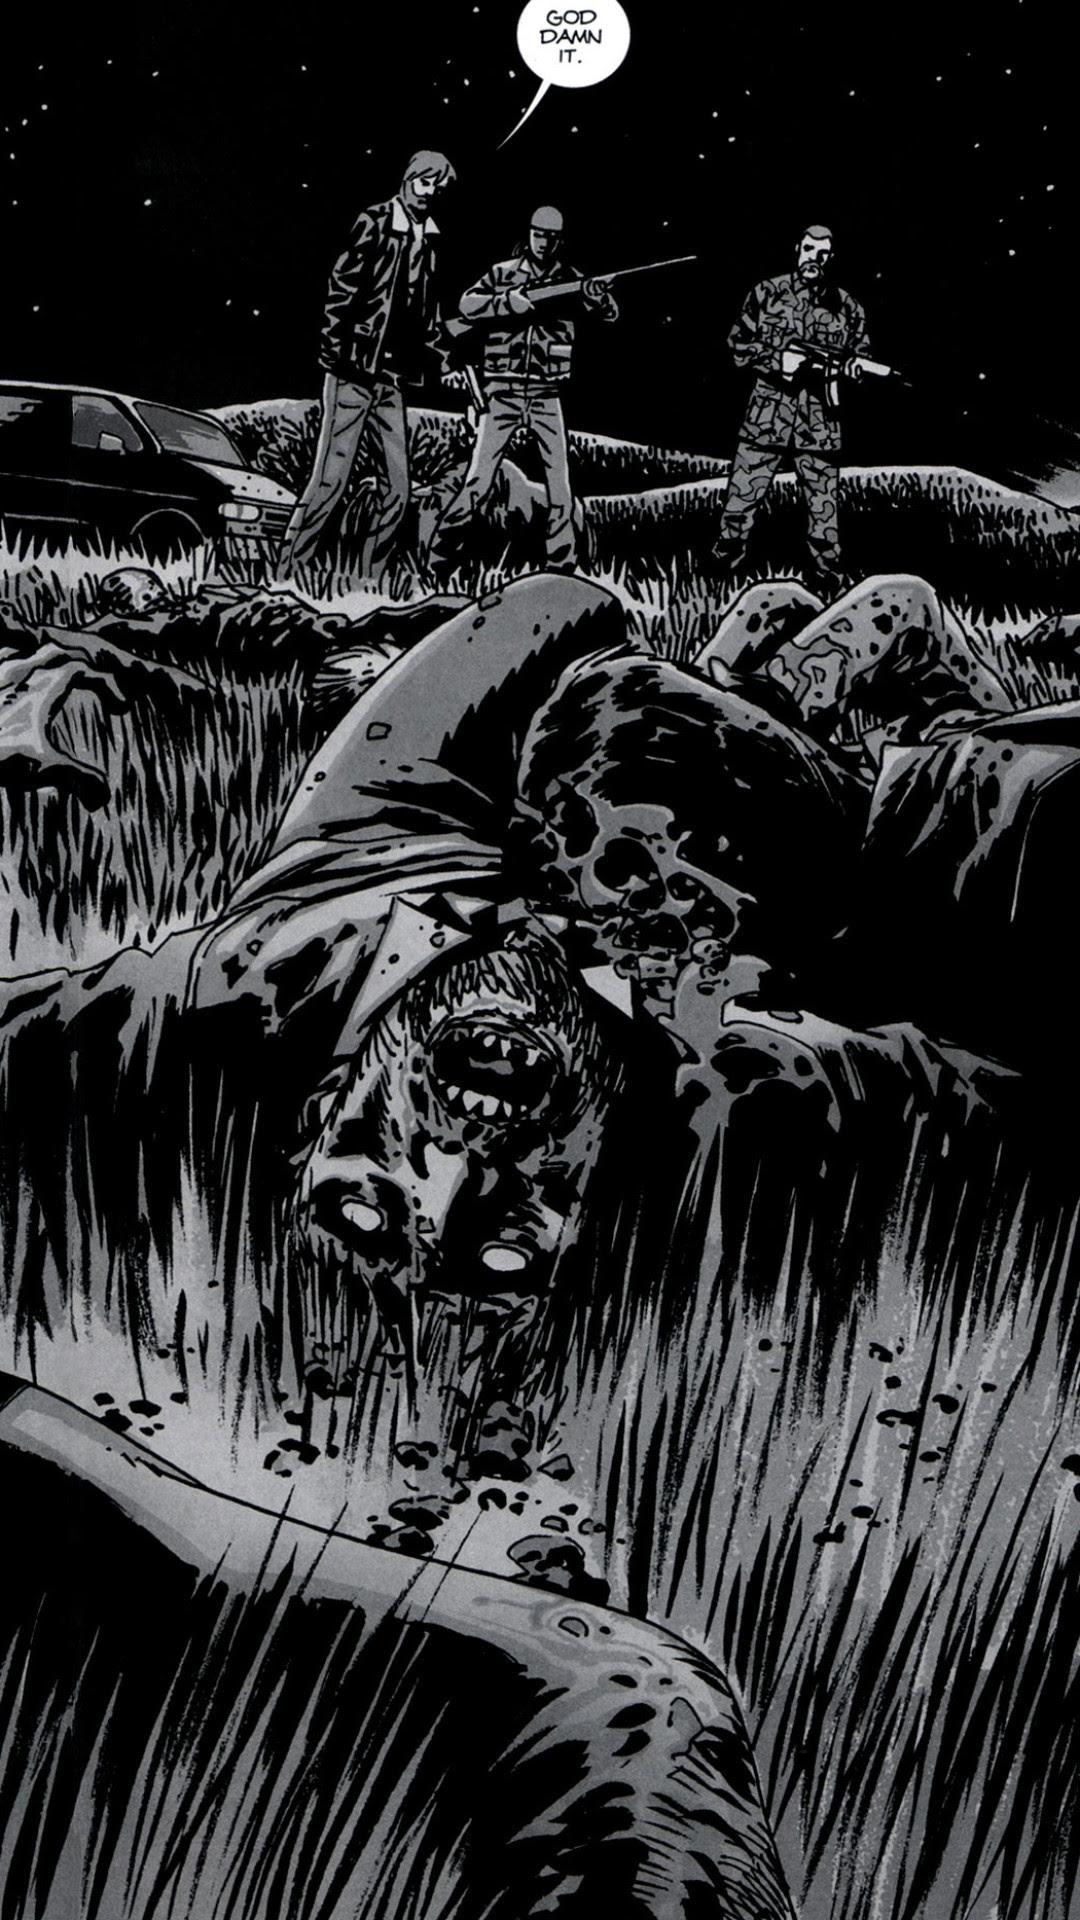 Walking Dead Comic Wallpaper 67 Images